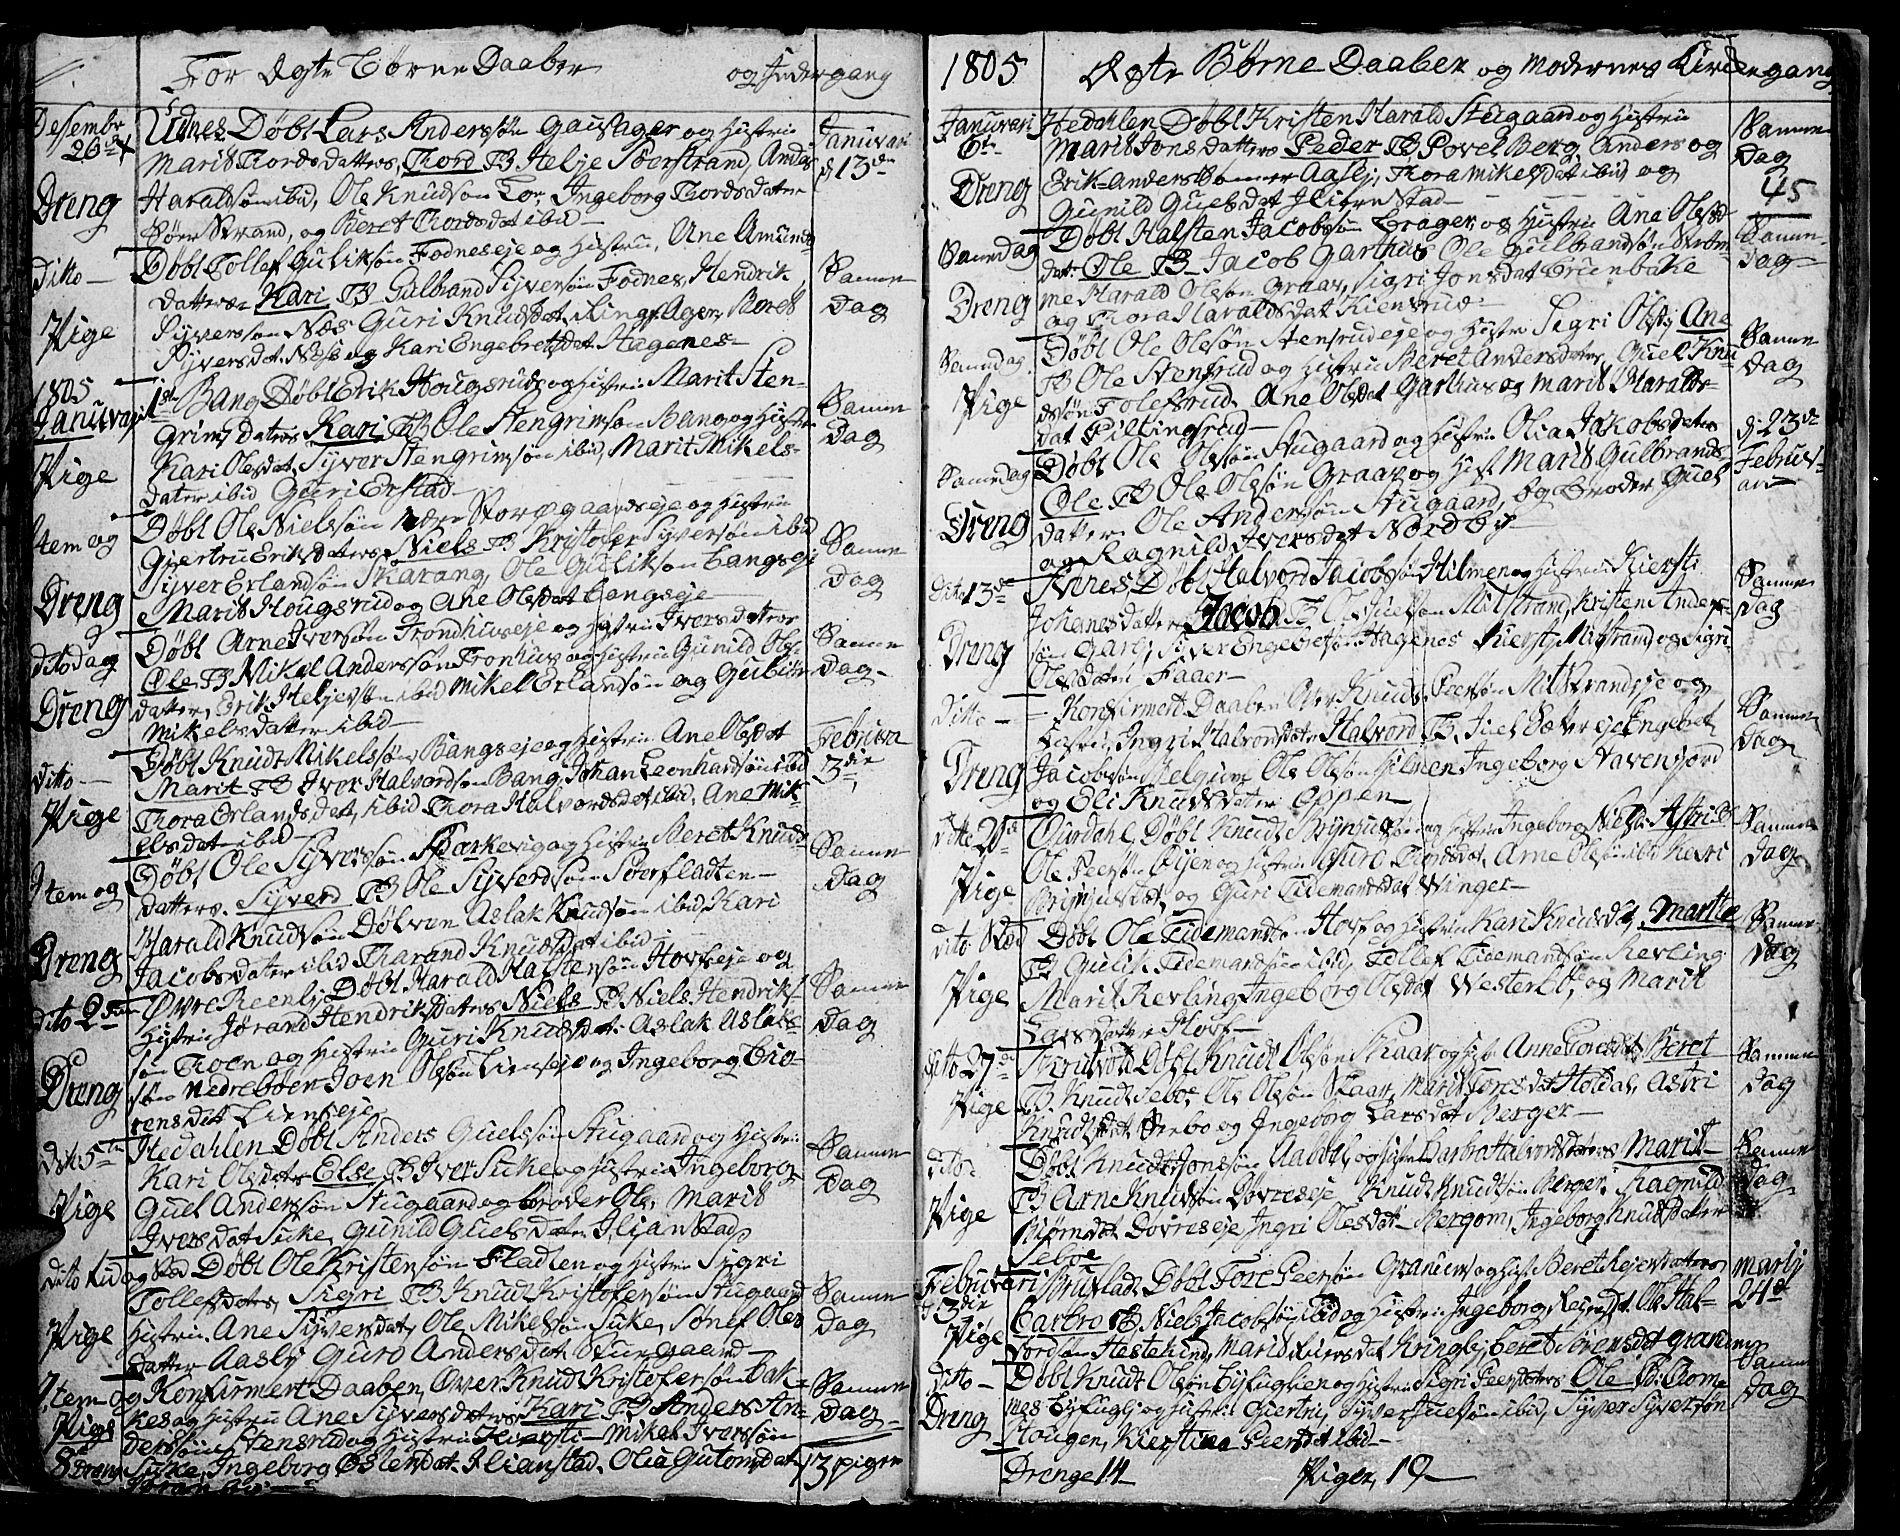 SAH, Aurdal prestekontor, Ministerialbok nr. 7, 1800-1808, s. 45